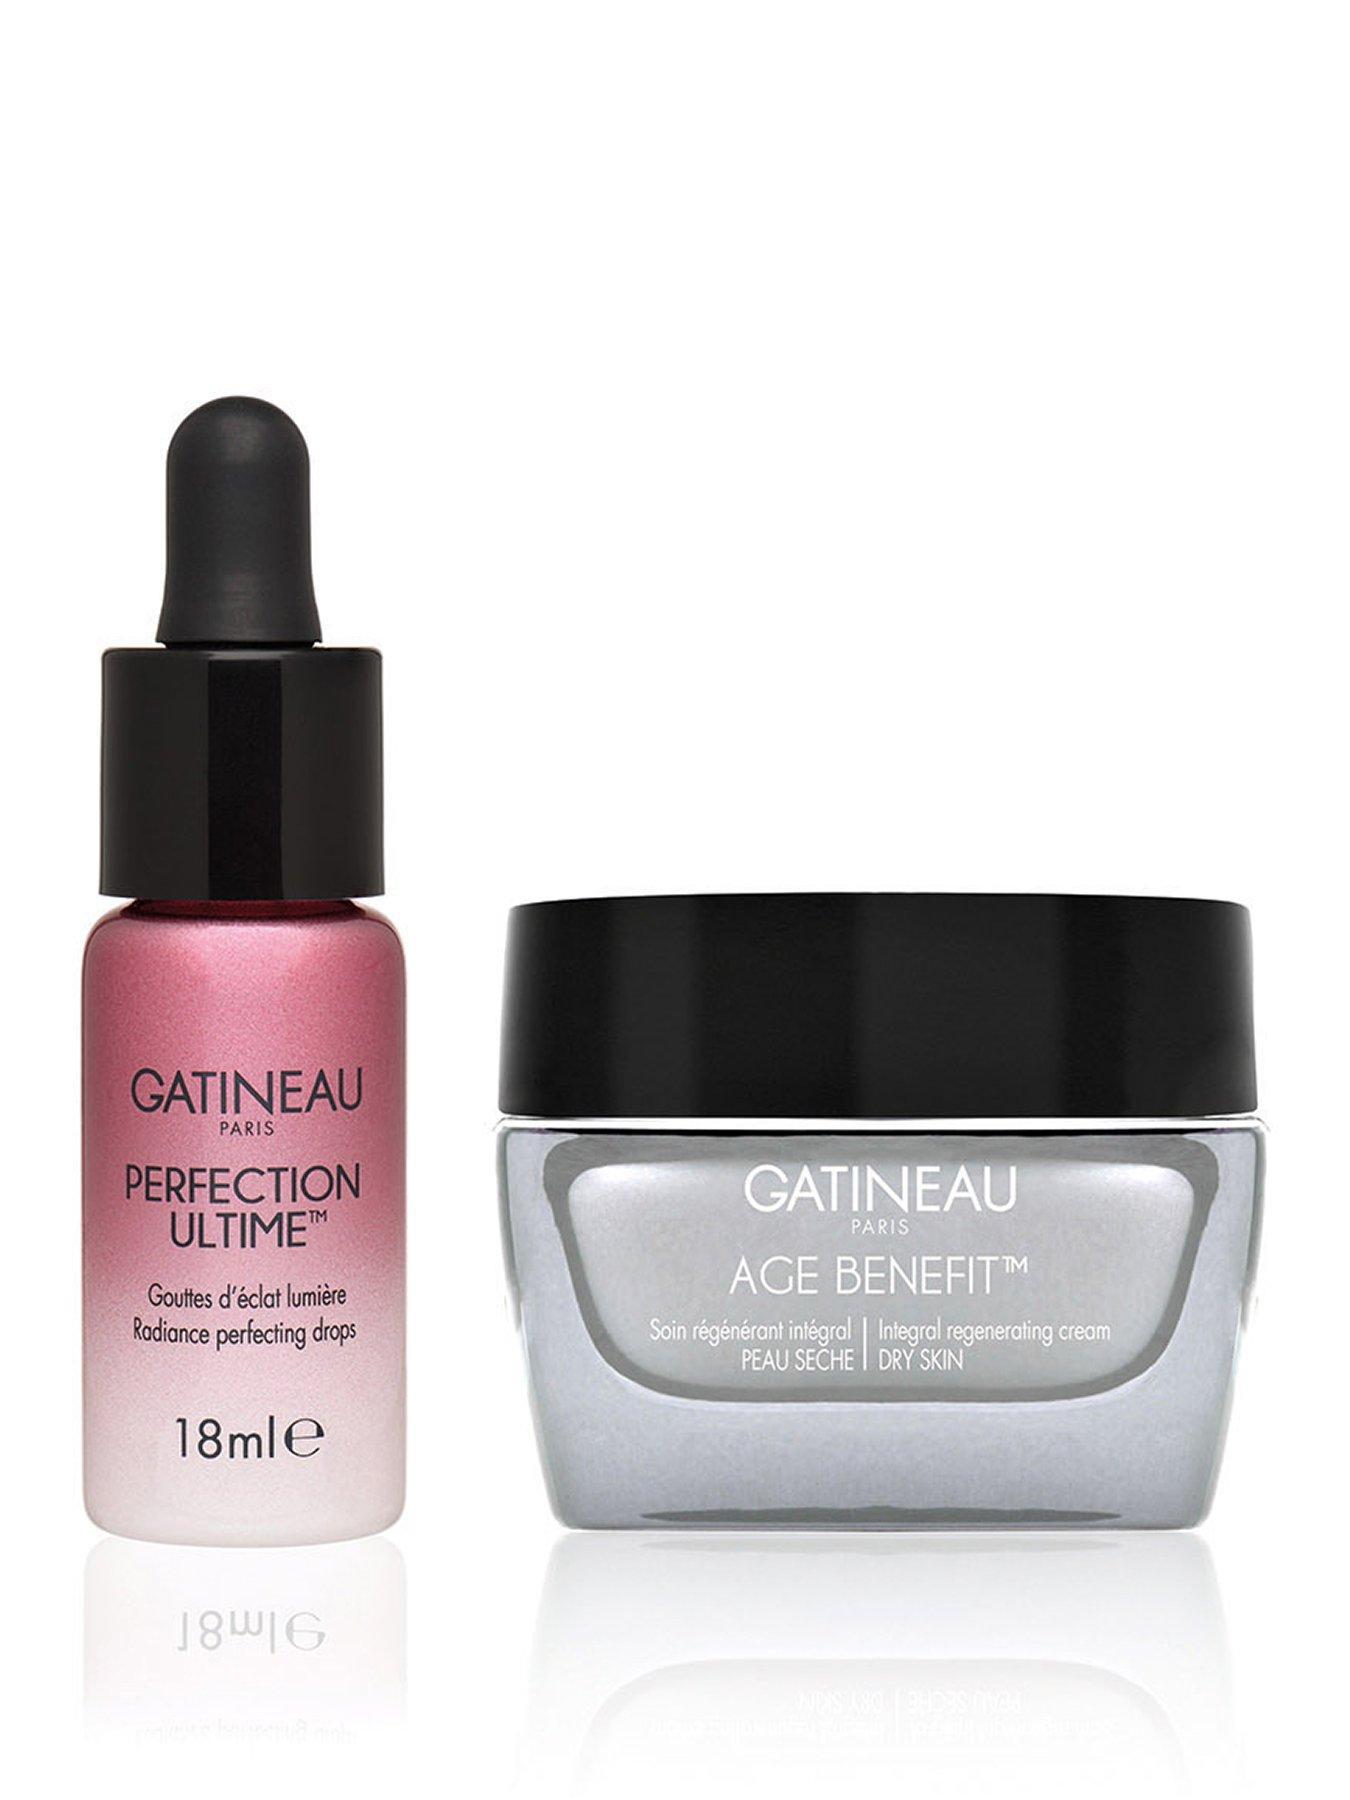 GATINEAU Age Benefit Regenerating Eye Cream   AbsoluteSkin (SA)